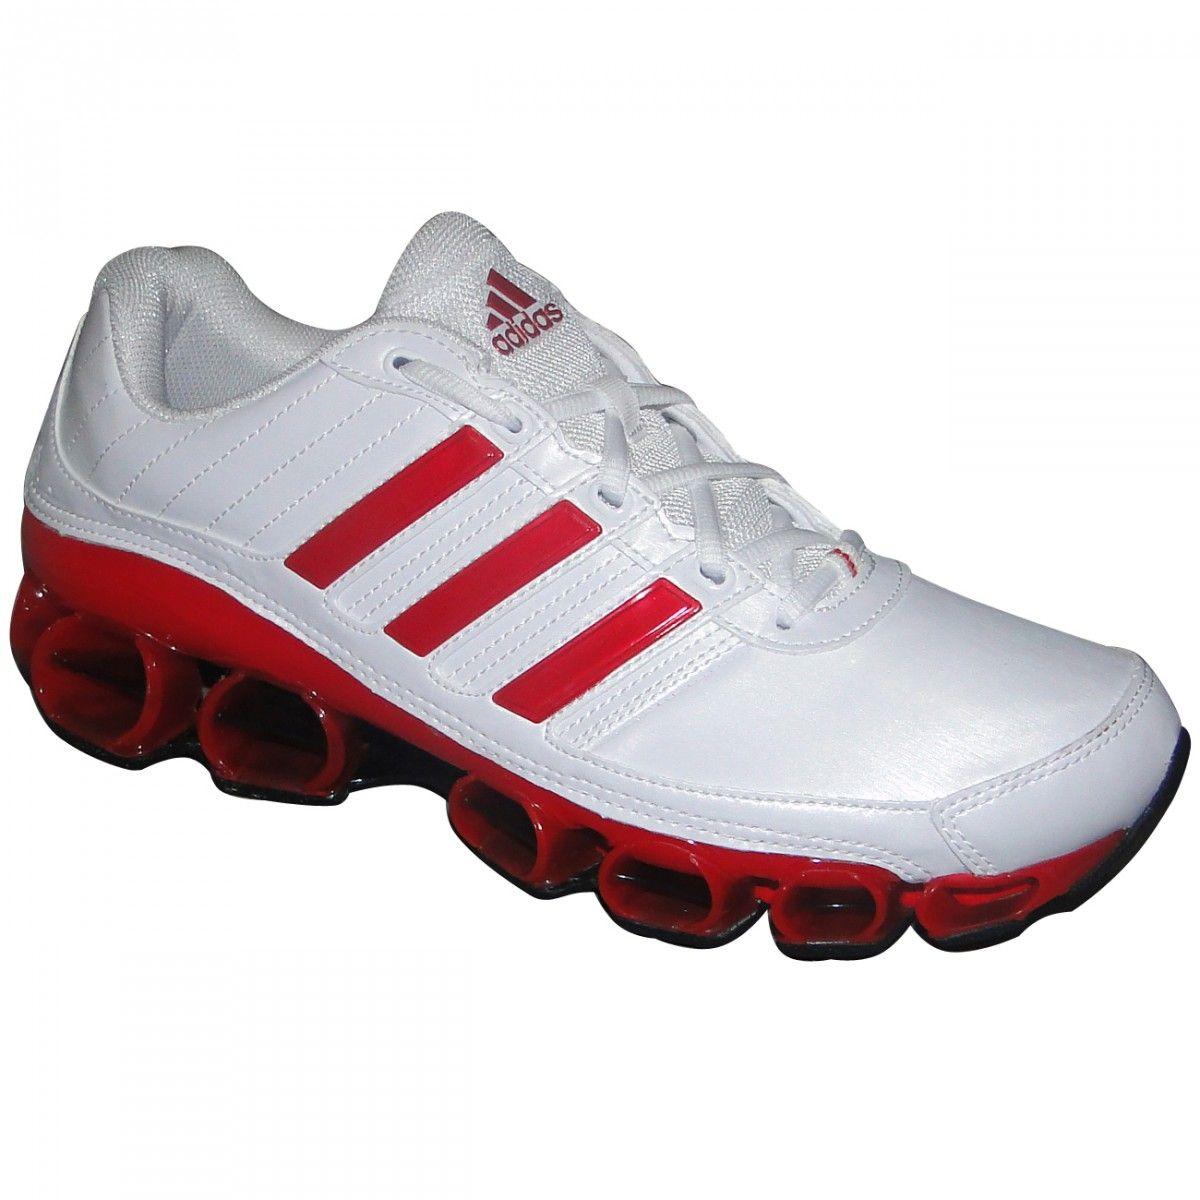 3ddbb0b0471 tenis-adidas-ambition-pb-4-737263e7282b308be3a052f152925bbd.jpg (1200×